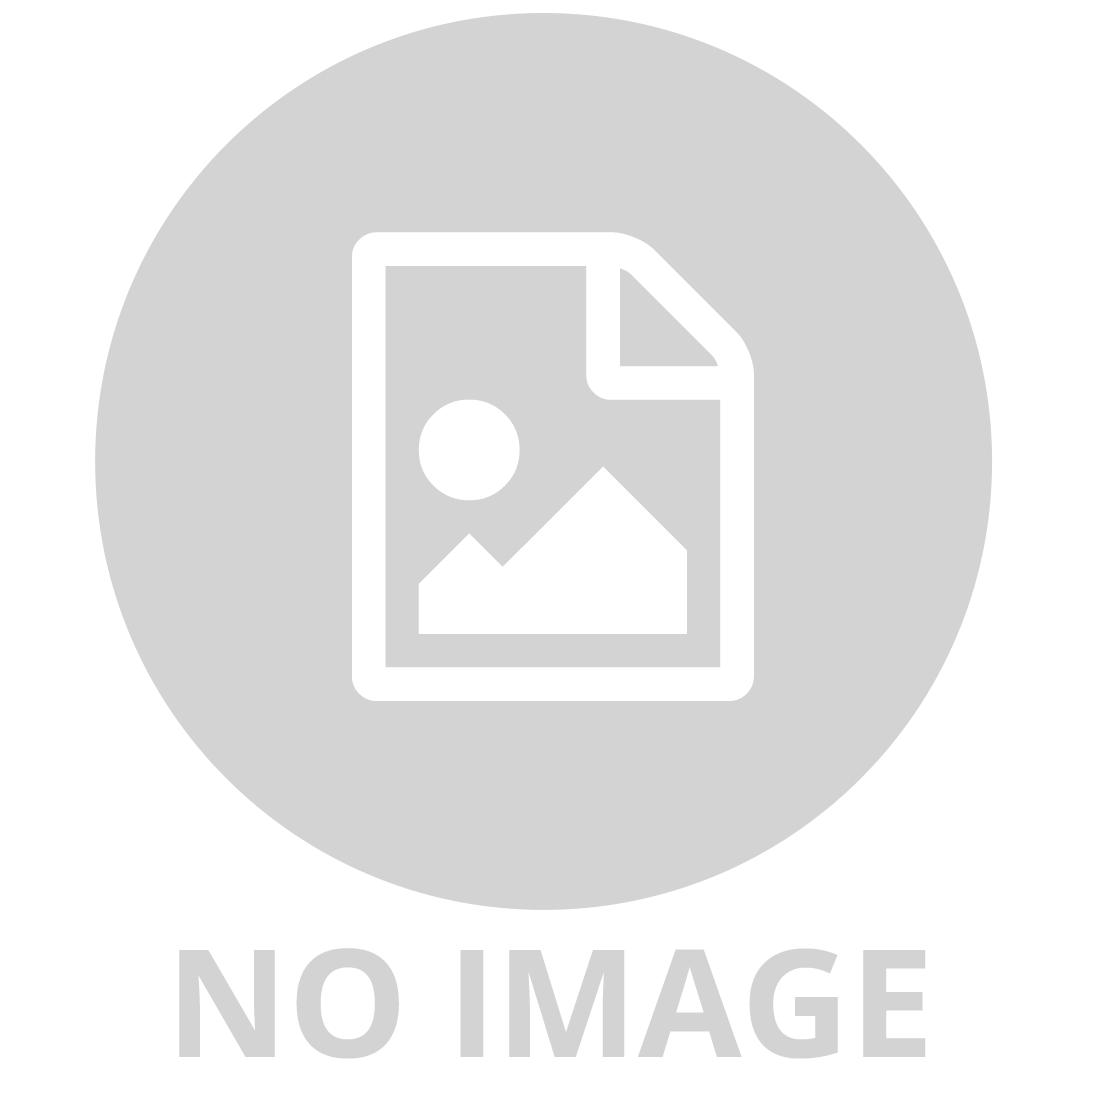 RAVENSBURGER MAGICAL FAIRY NIGHT 100PCE JIGSAW PUZZLE